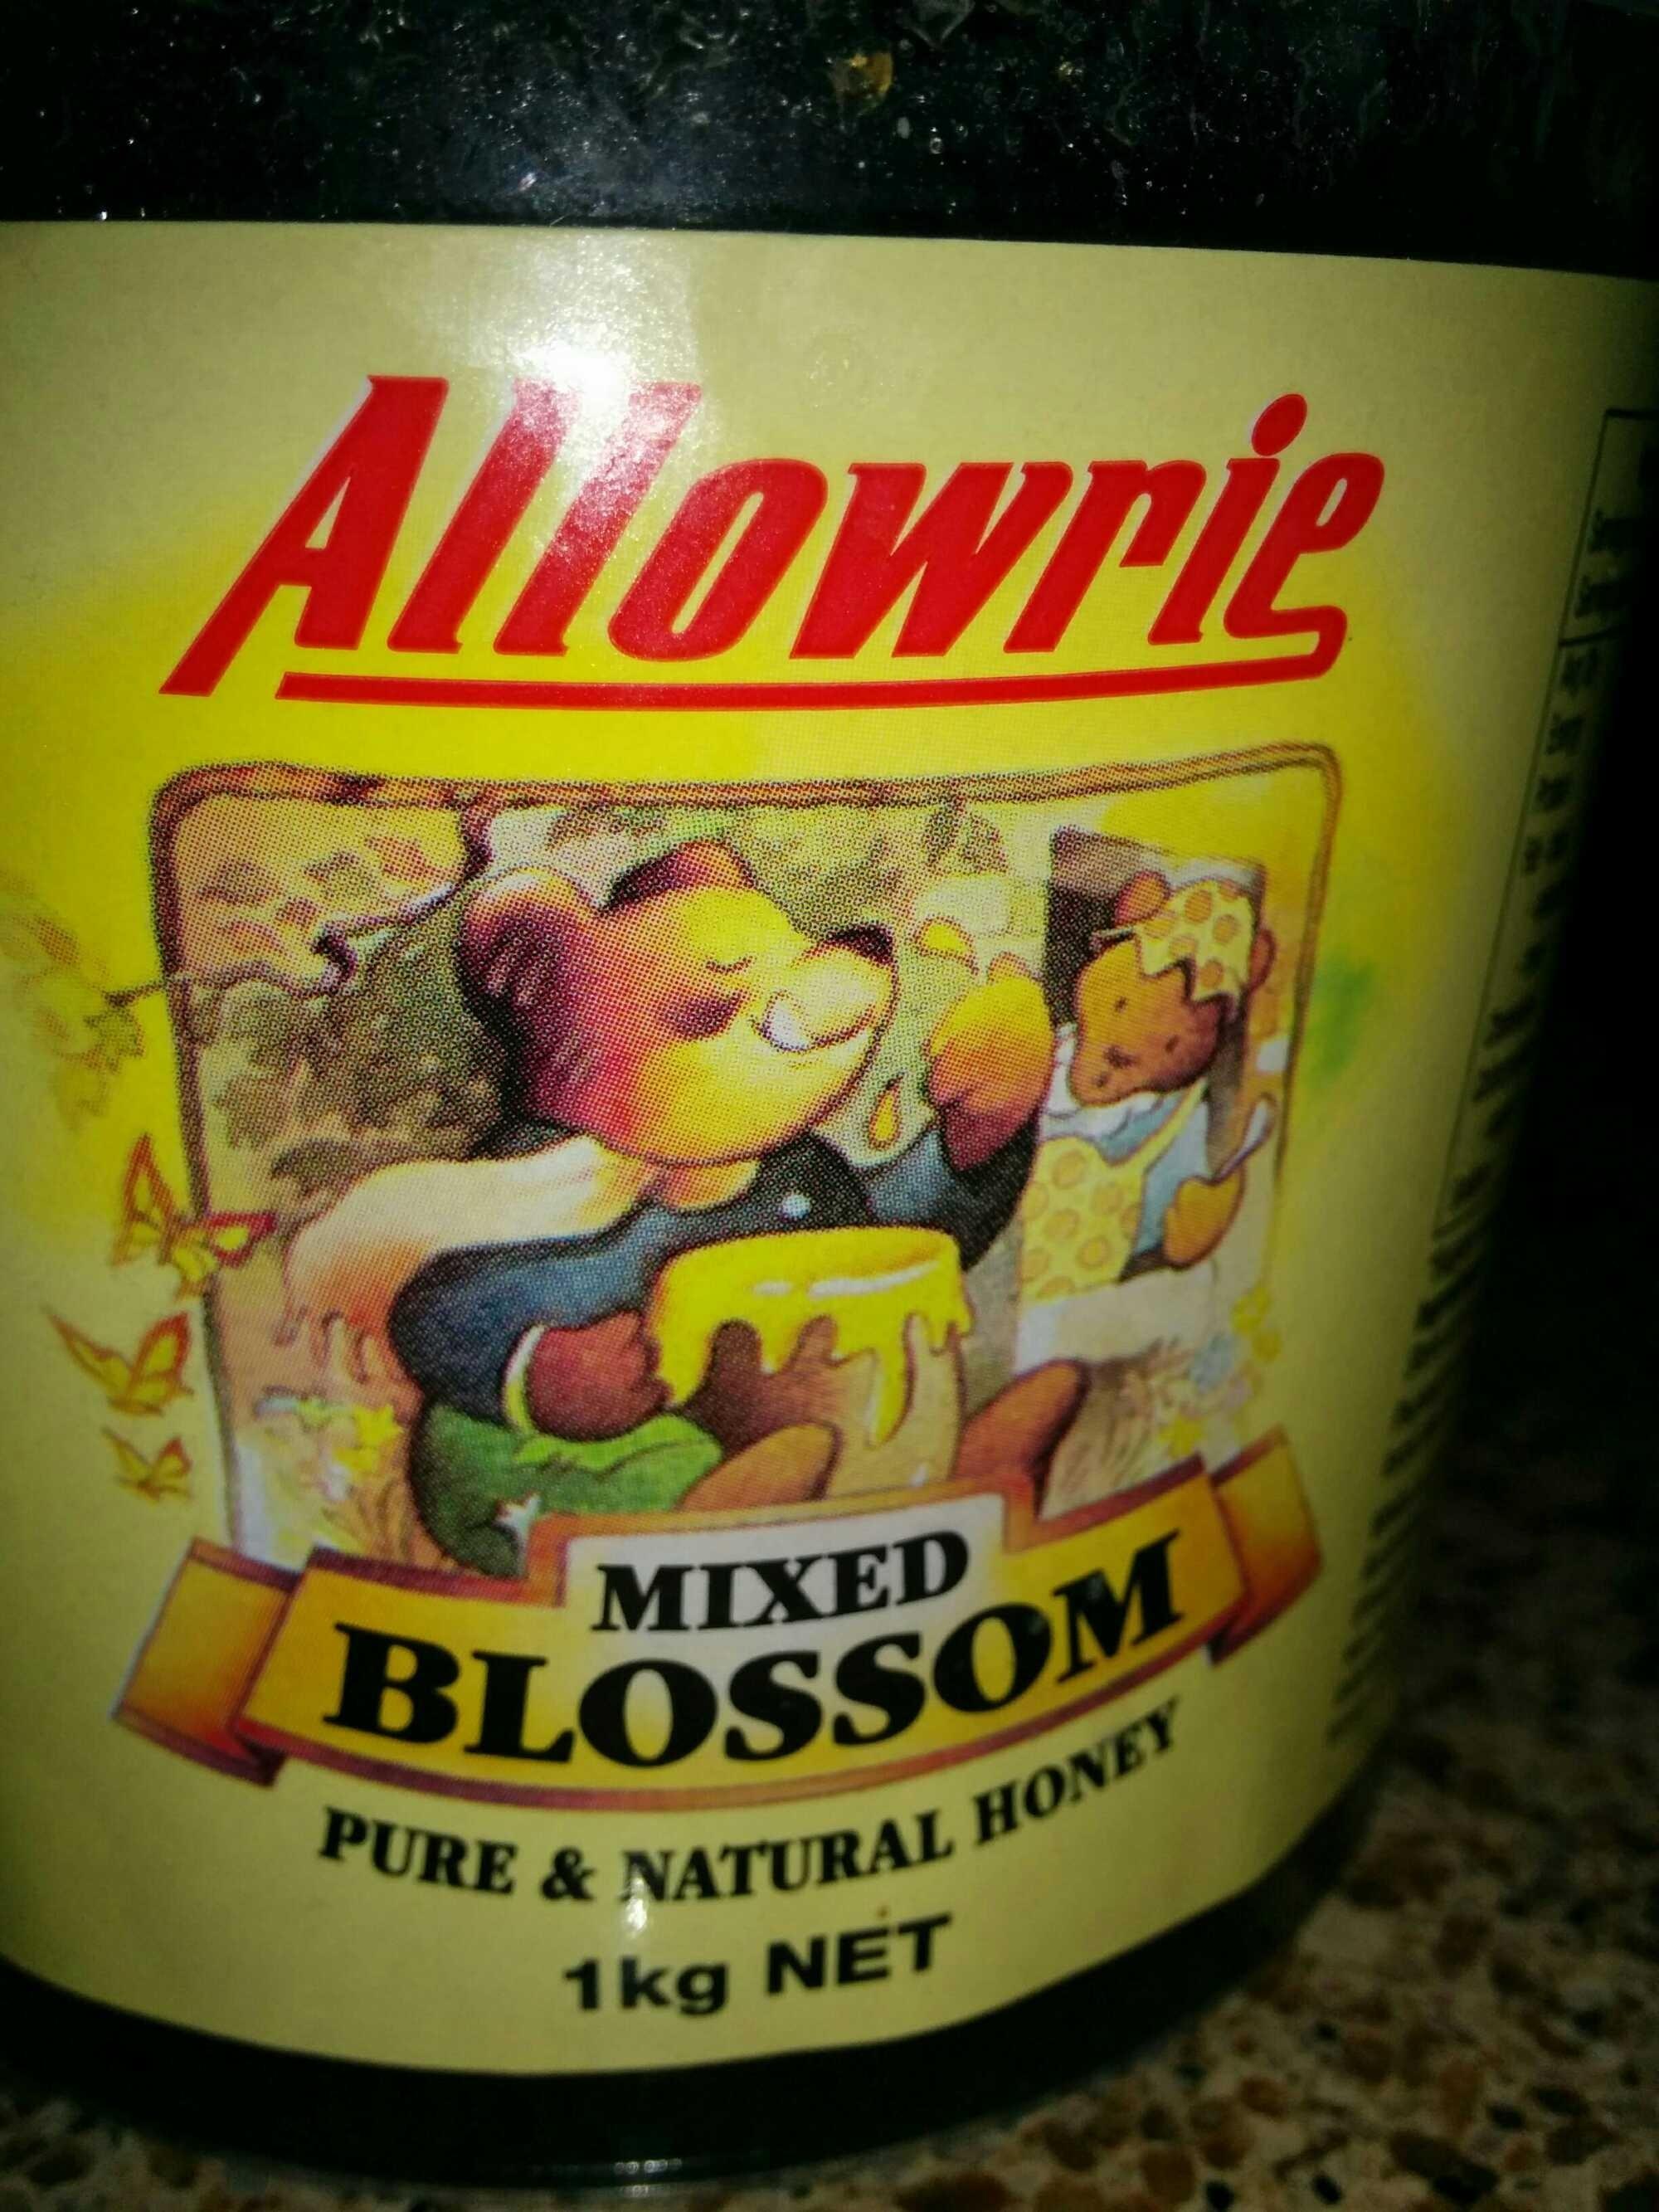 Mixed Blossom pure & natural honey - Product - en